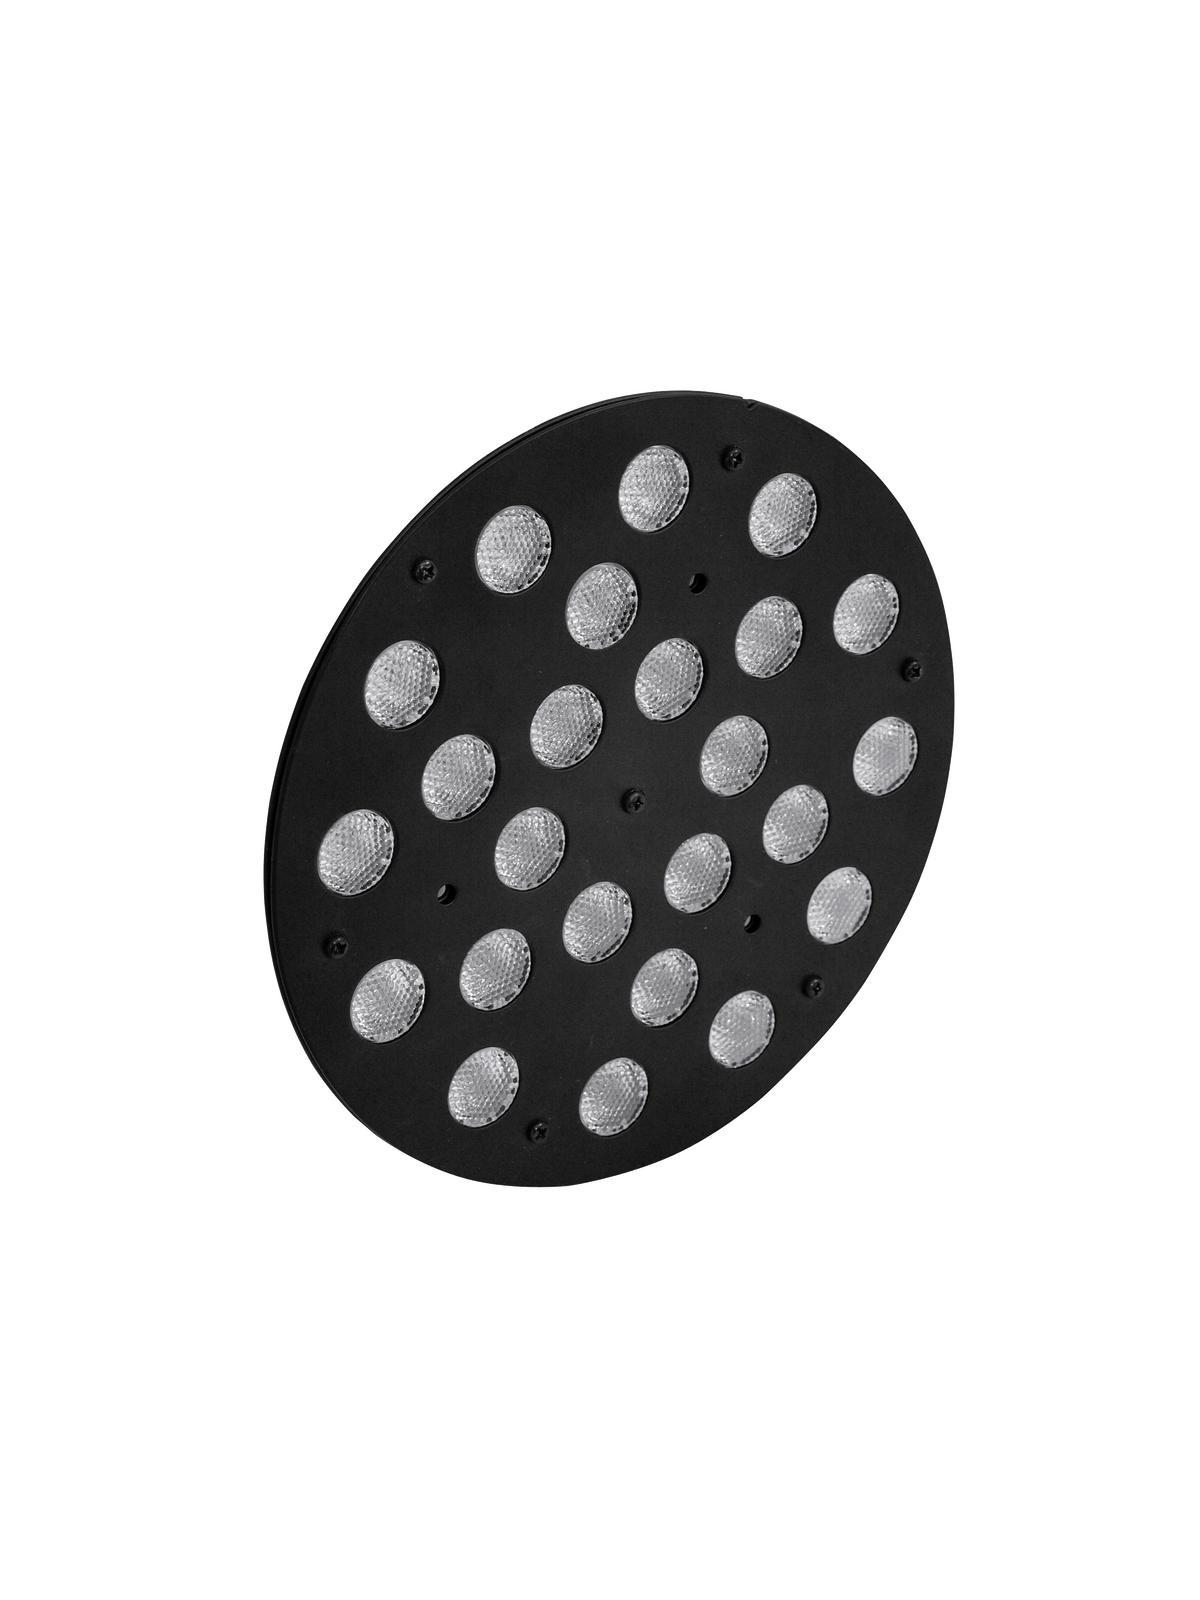 EUROLITE kit Obiettivo a 45° per ML-56 RGBA/RGBW nero